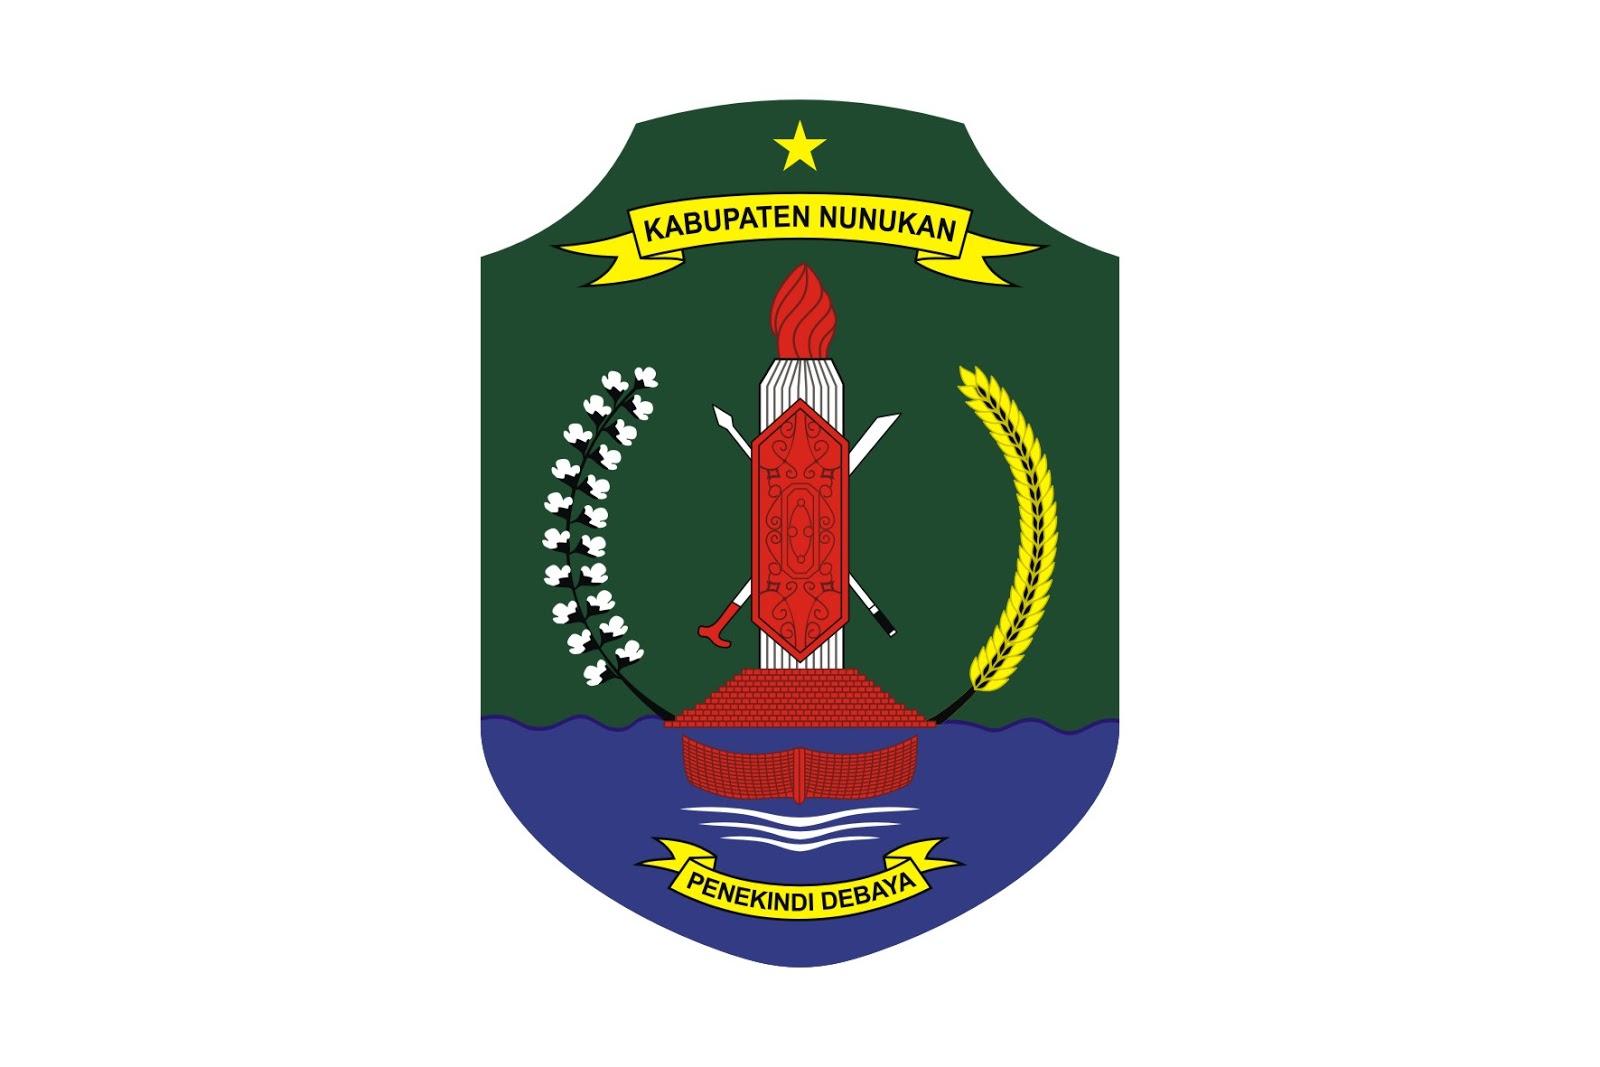 Kabupaten Nunukan Logo